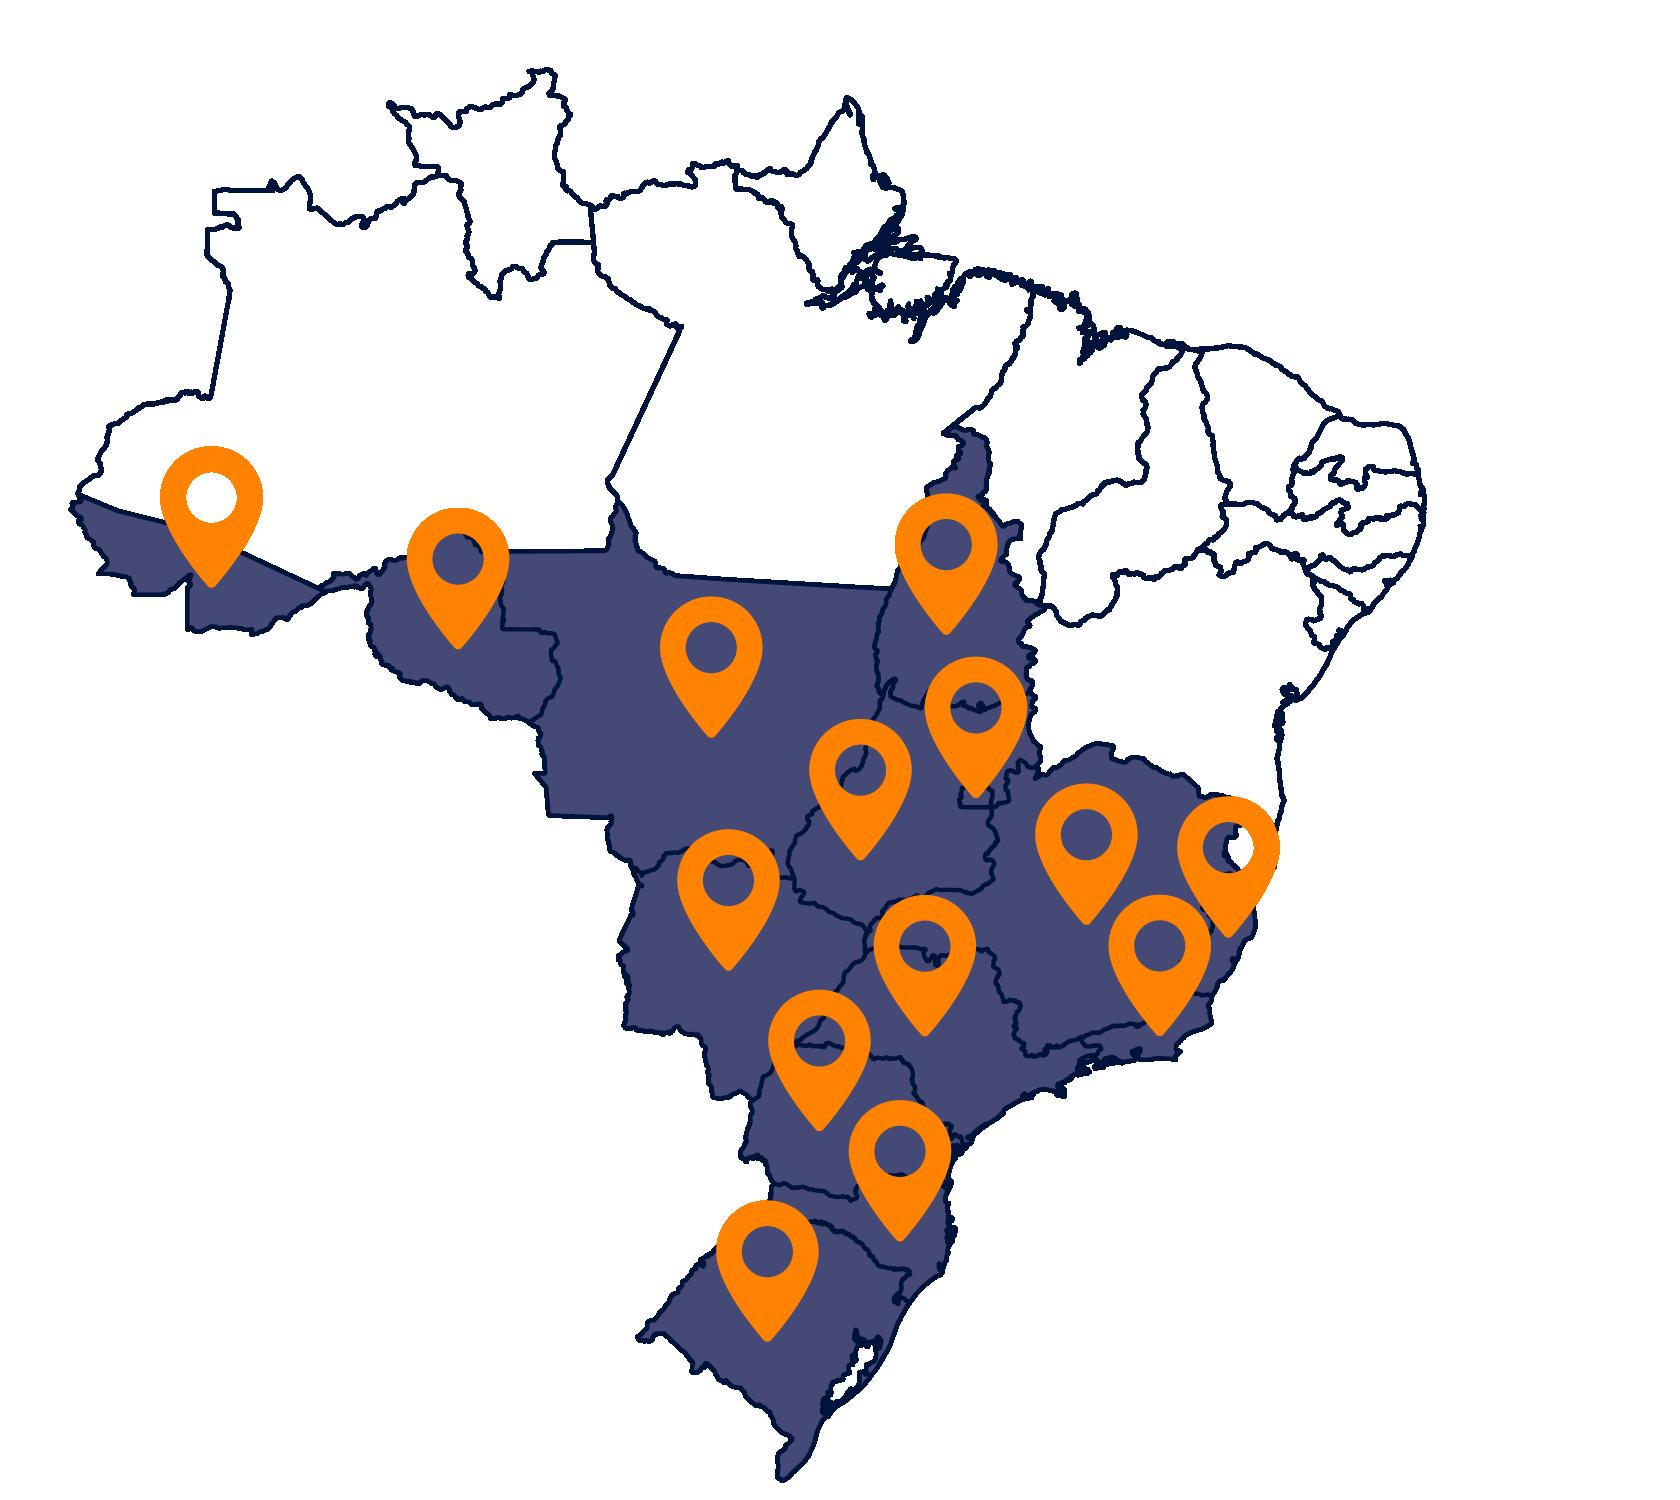 http://www.tsvtransportes.com.br/wp-content/uploads/2018/10/mapa-1-01.png